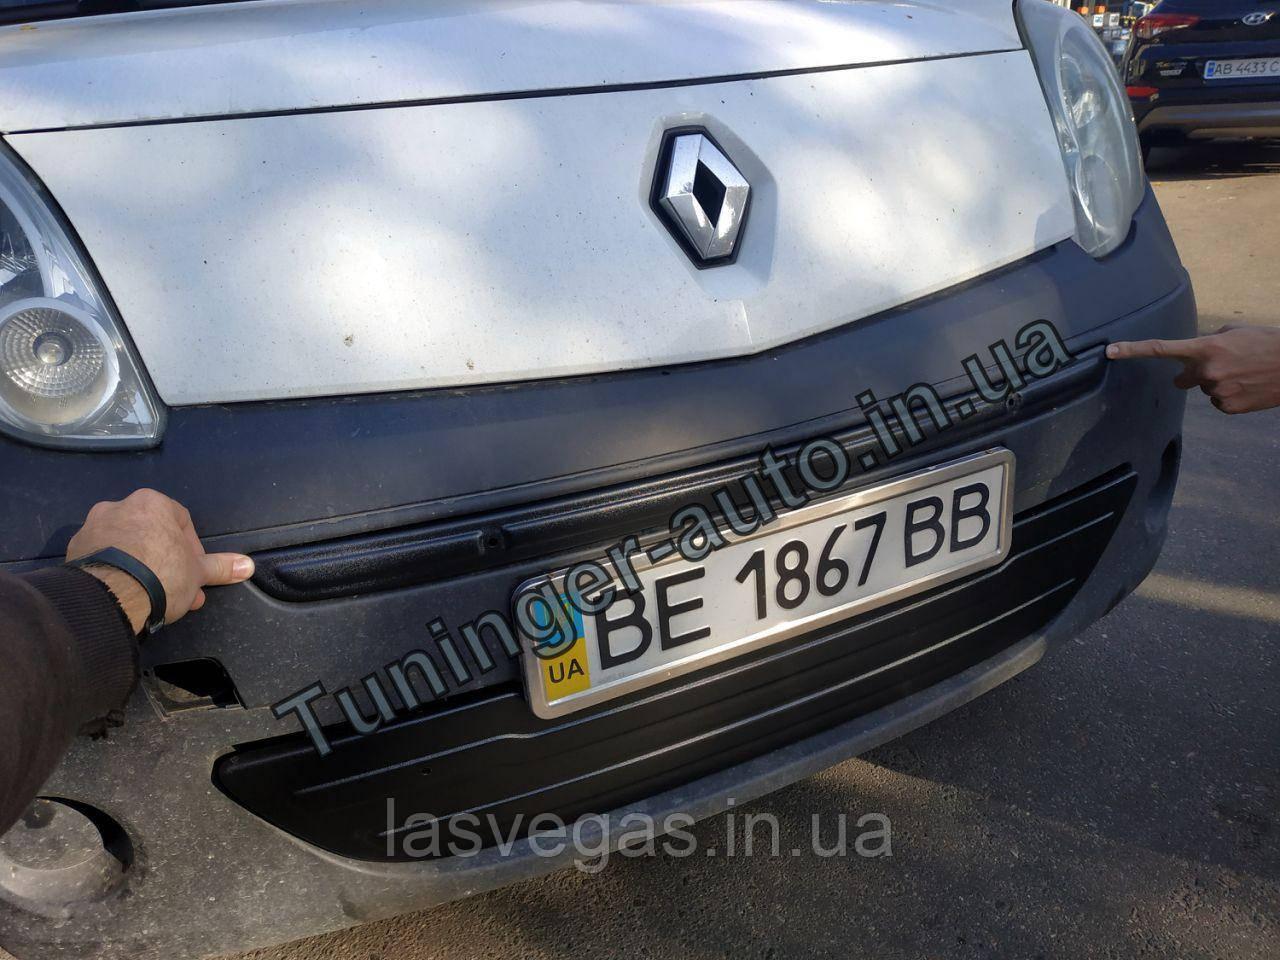 Зимняя накладка на решетку Renault Kangoo 2008-2013г.в. (Верх)